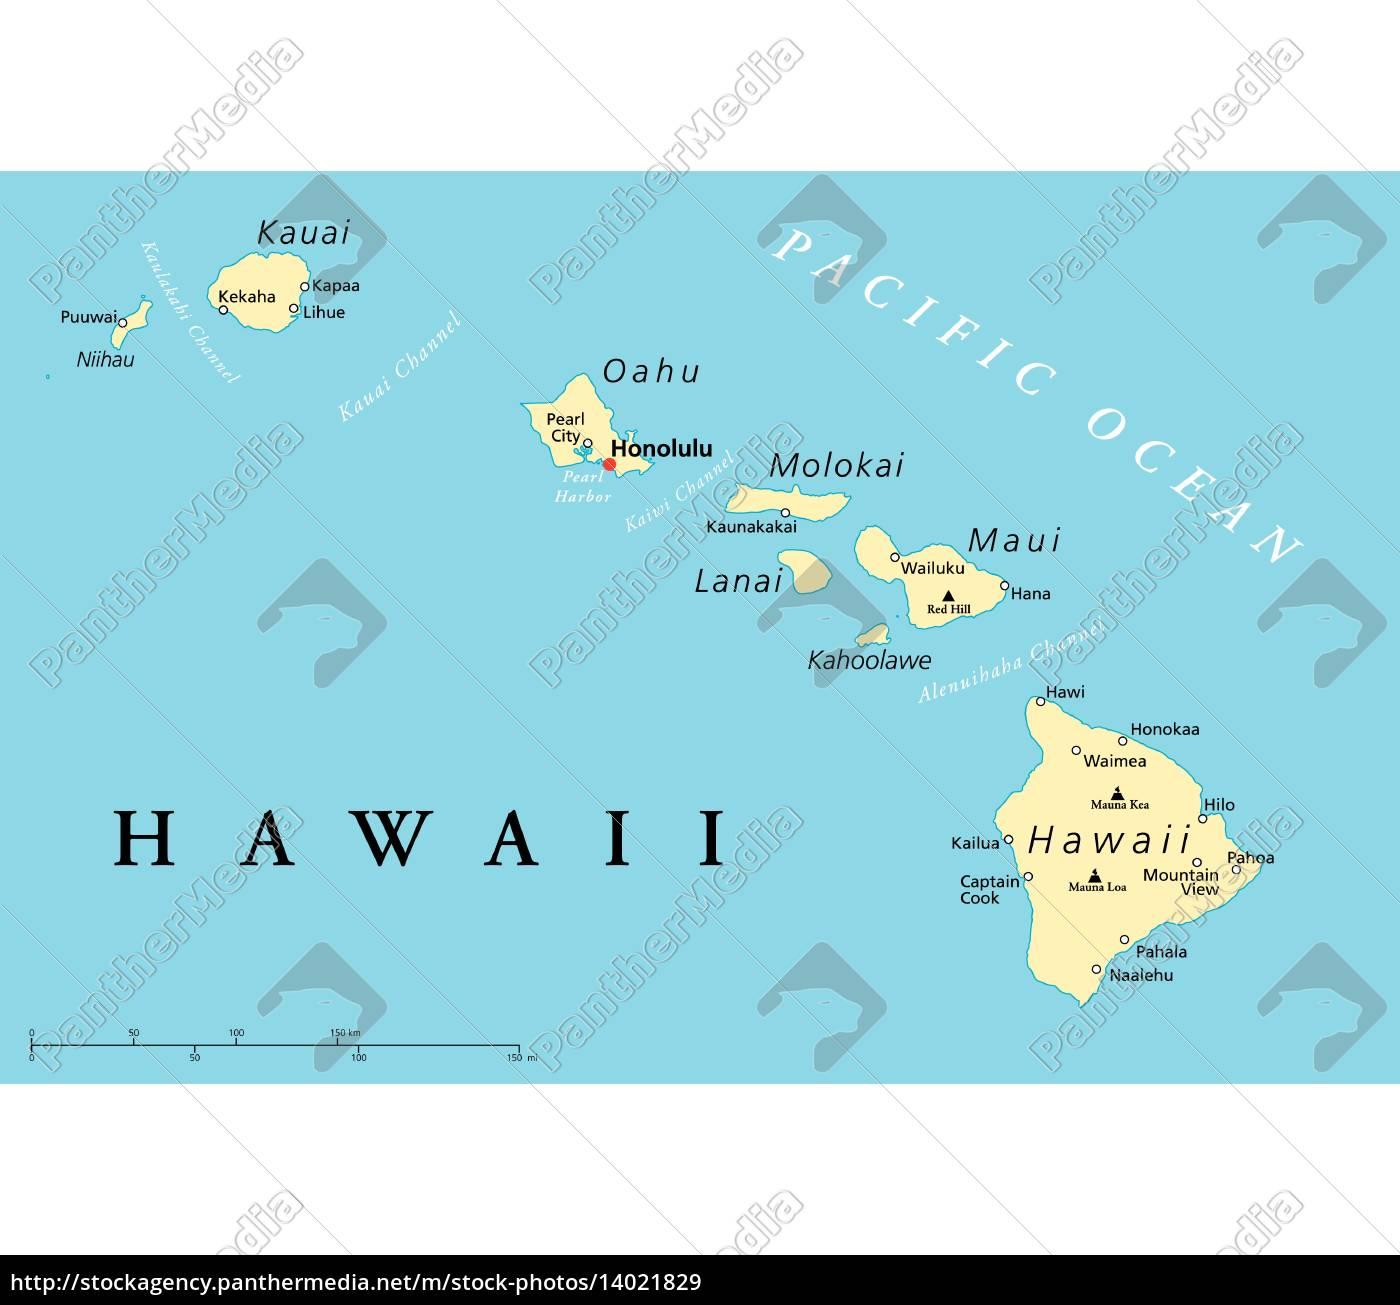 karte hawaii hawaii inseln politische karte   Stockfoto   #14021829